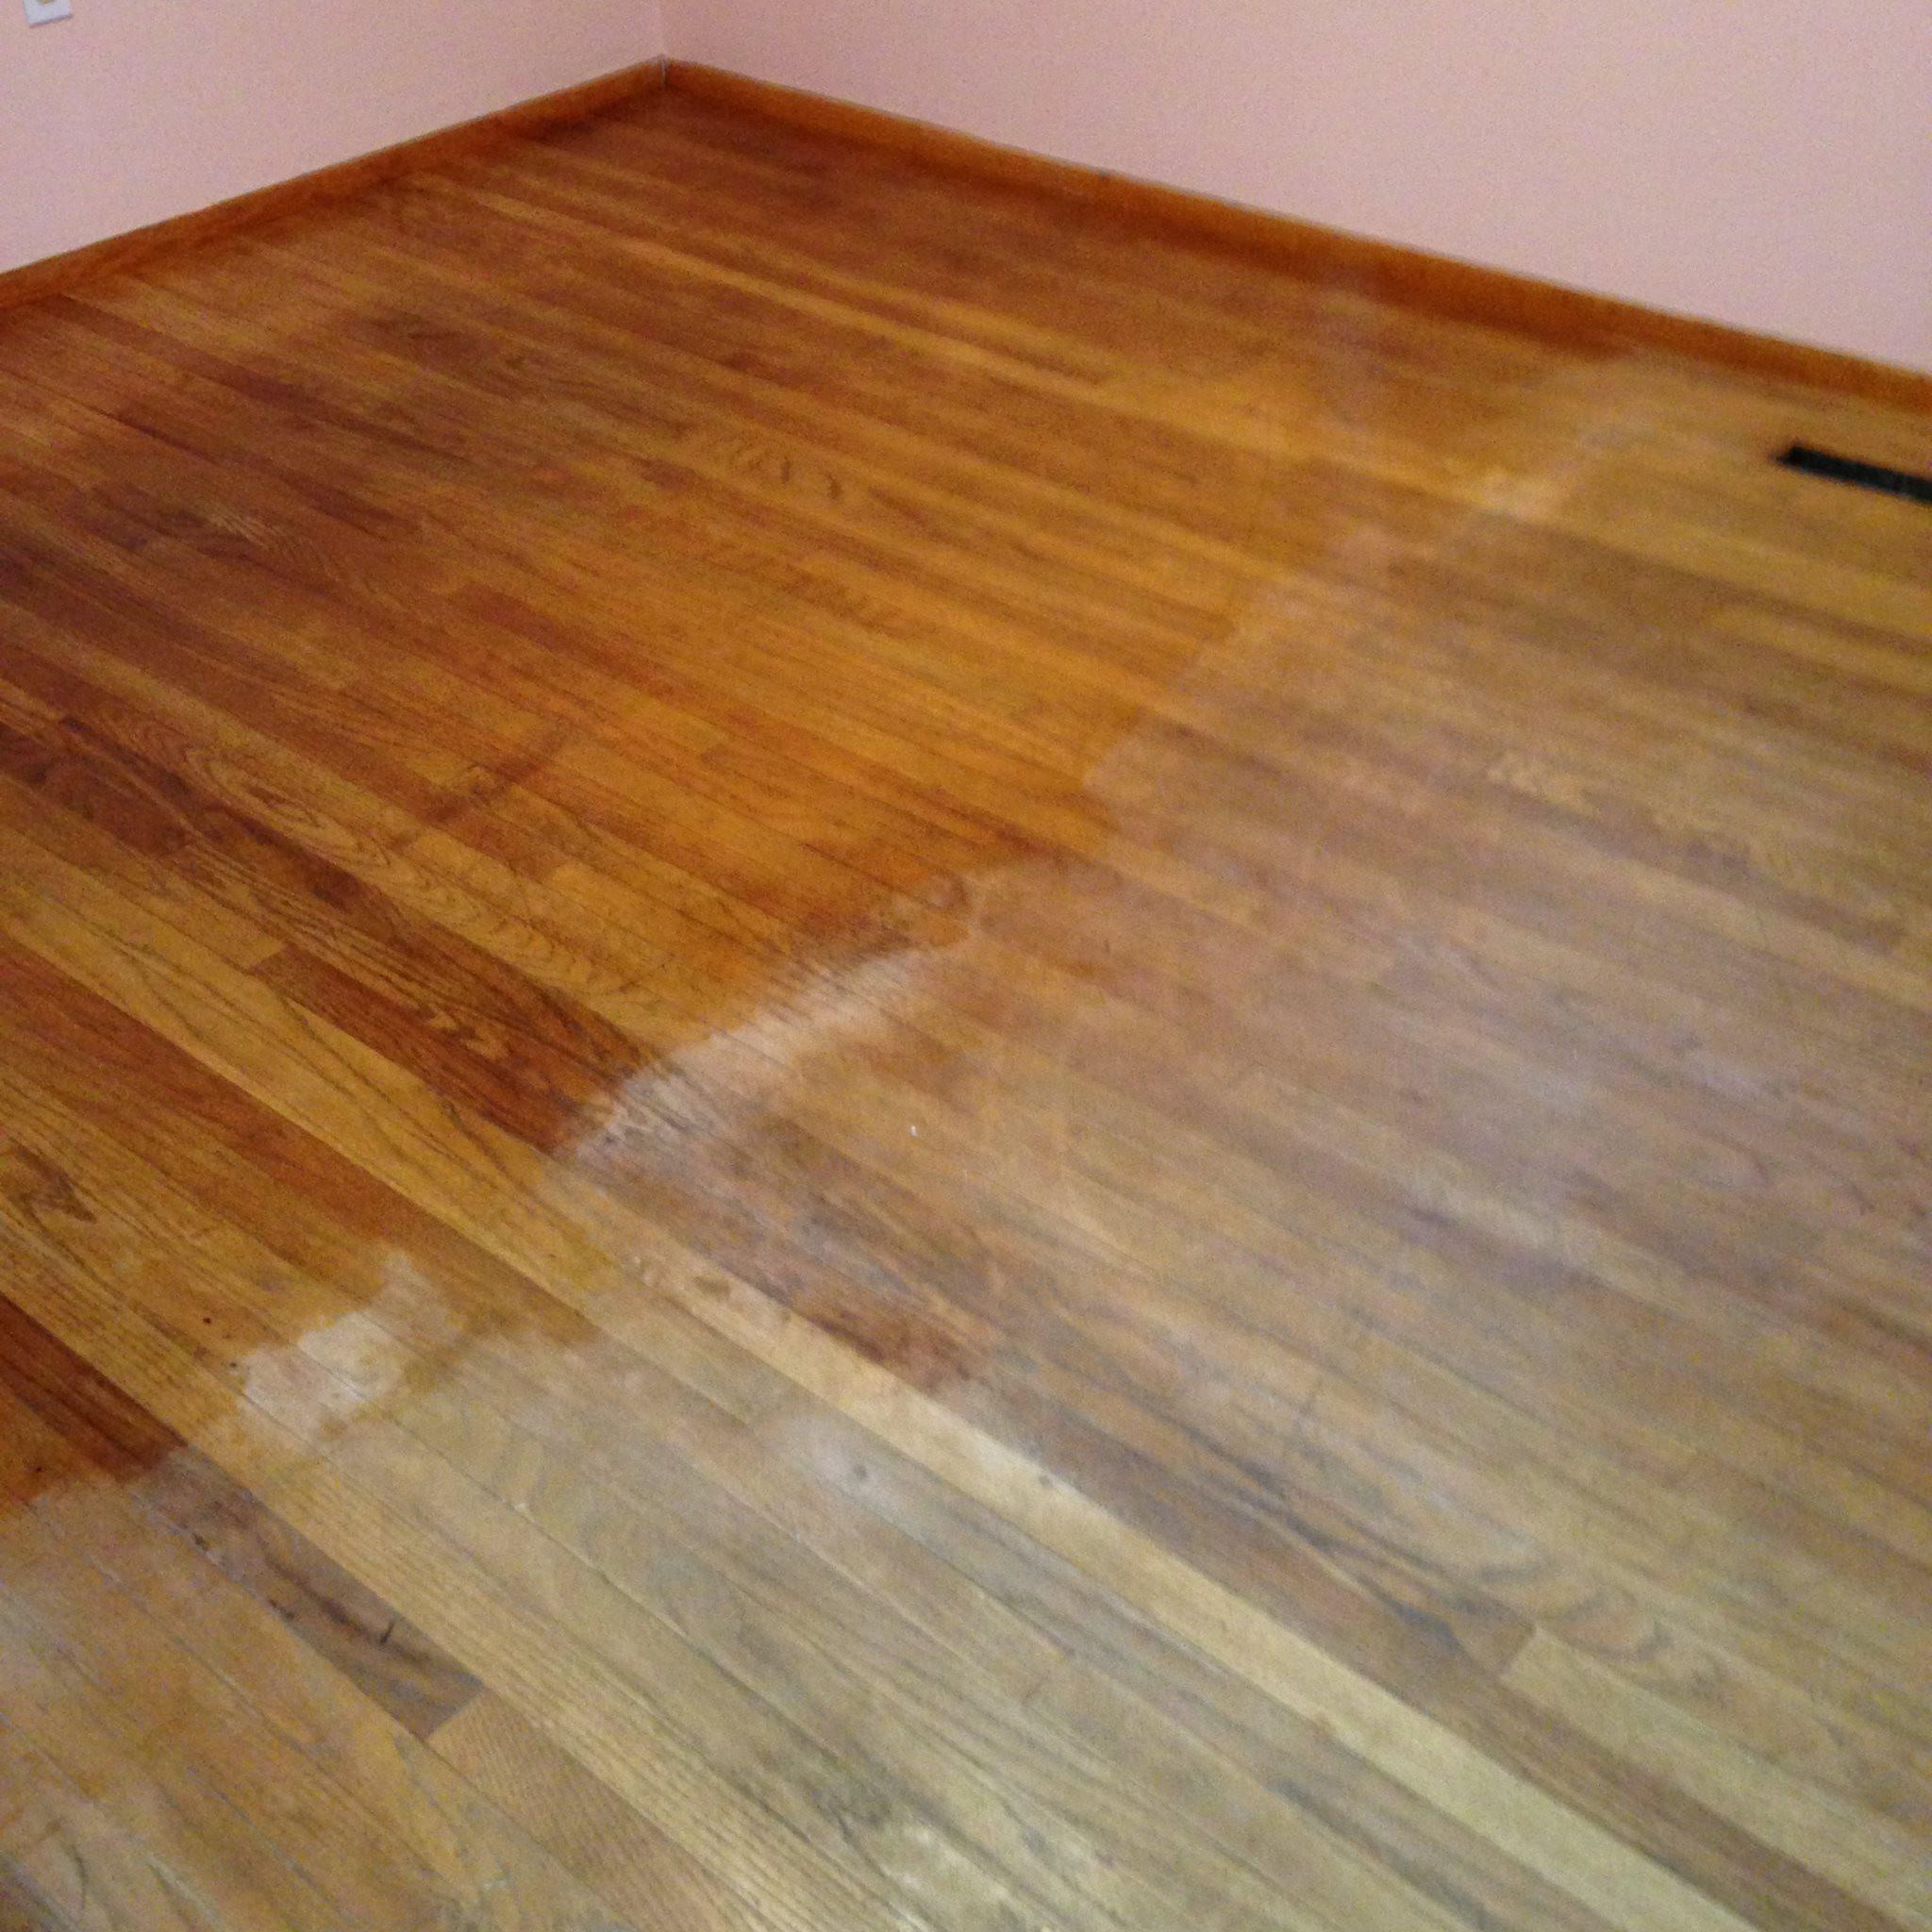 manufactured hardwood floor cleaner of 15 wood floor hacks every homeowner needs to know intended for wood floor hacks 15